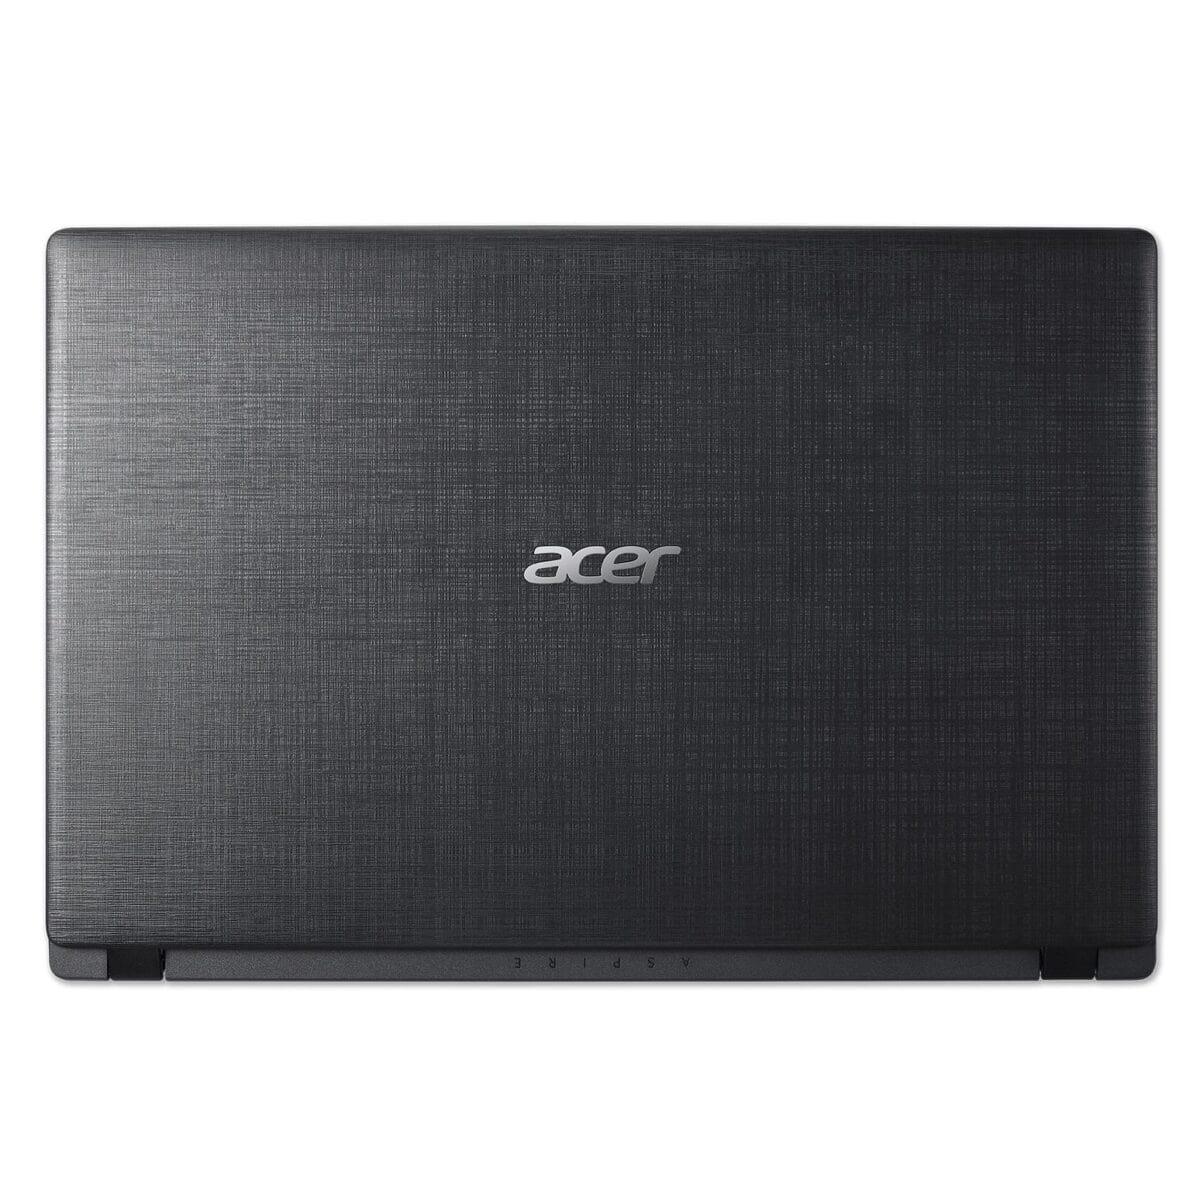 "Acer Aspire 15.6"" Laptop 250GB SSD 8GB Powerful Windows 10 Webcam"